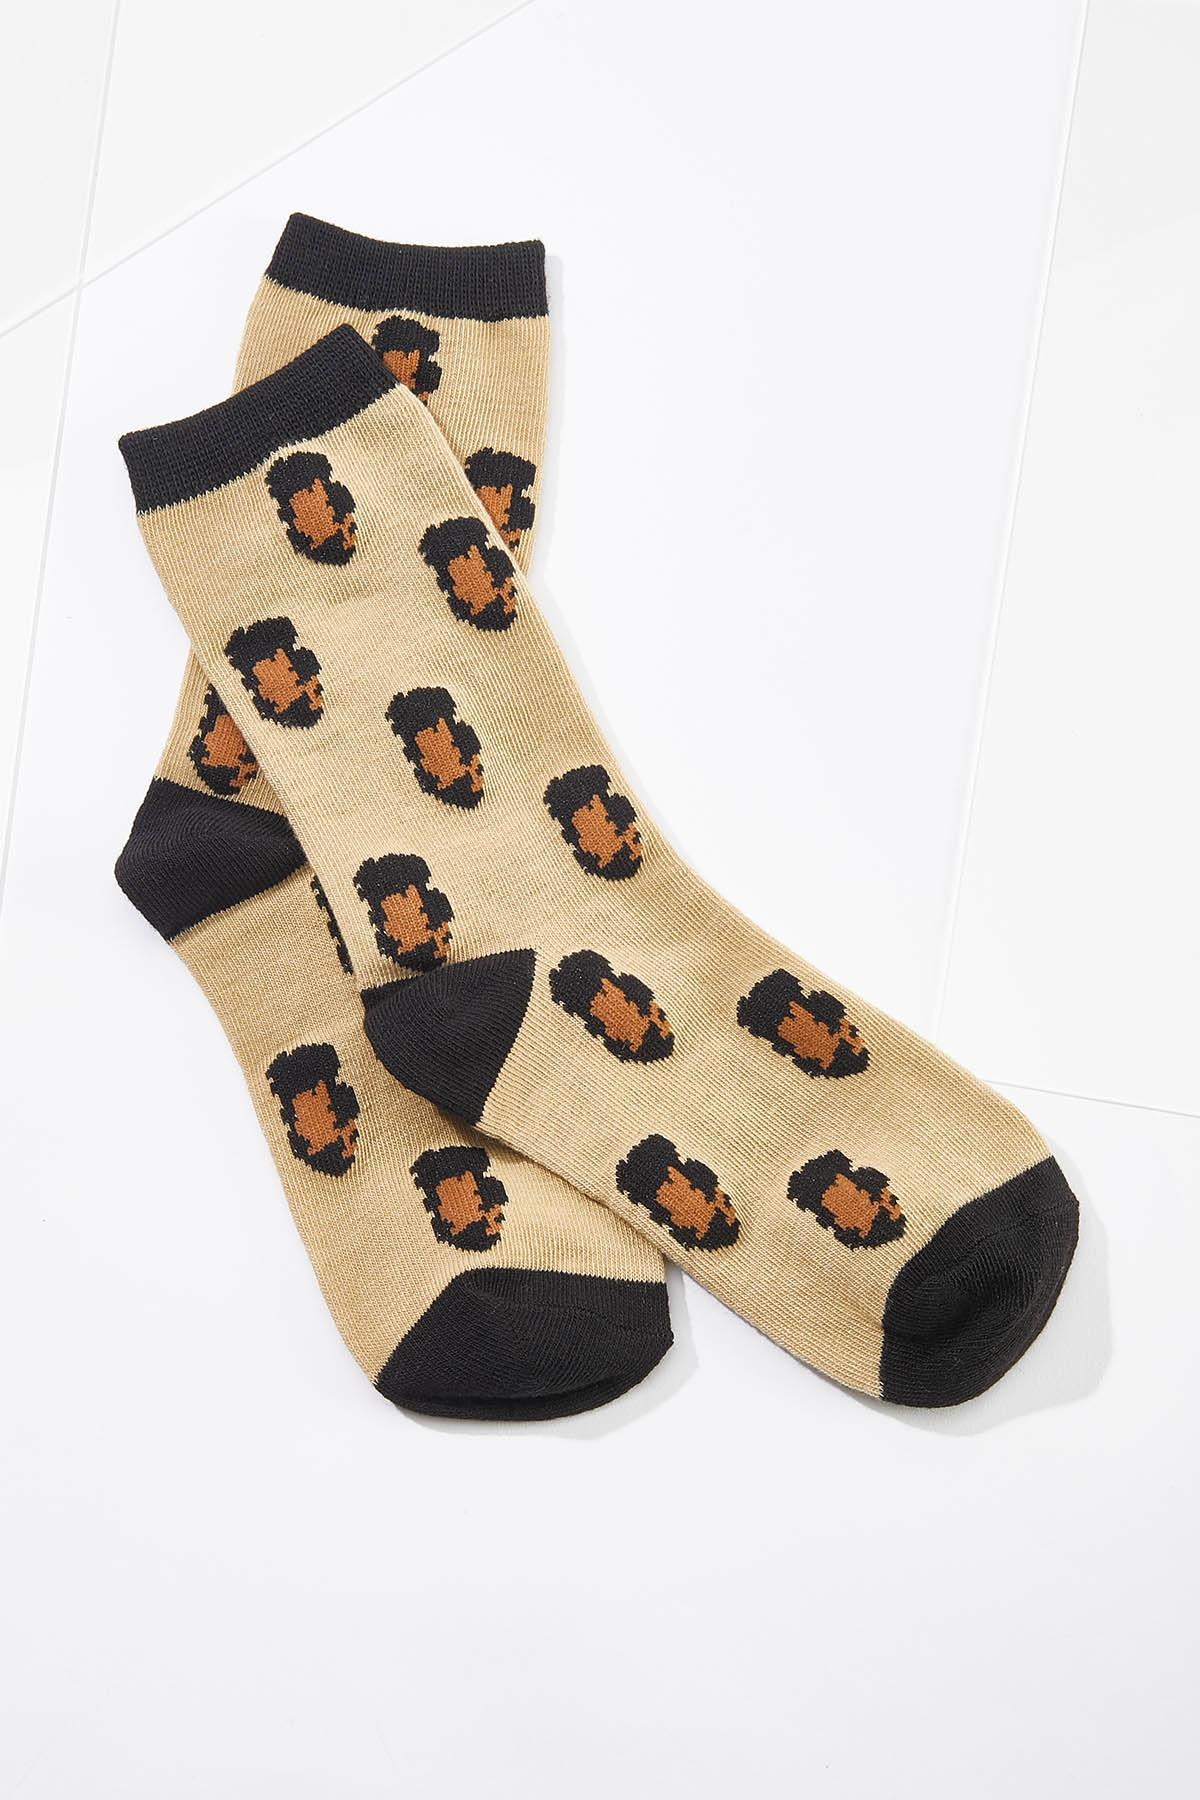 Animal Print Socks